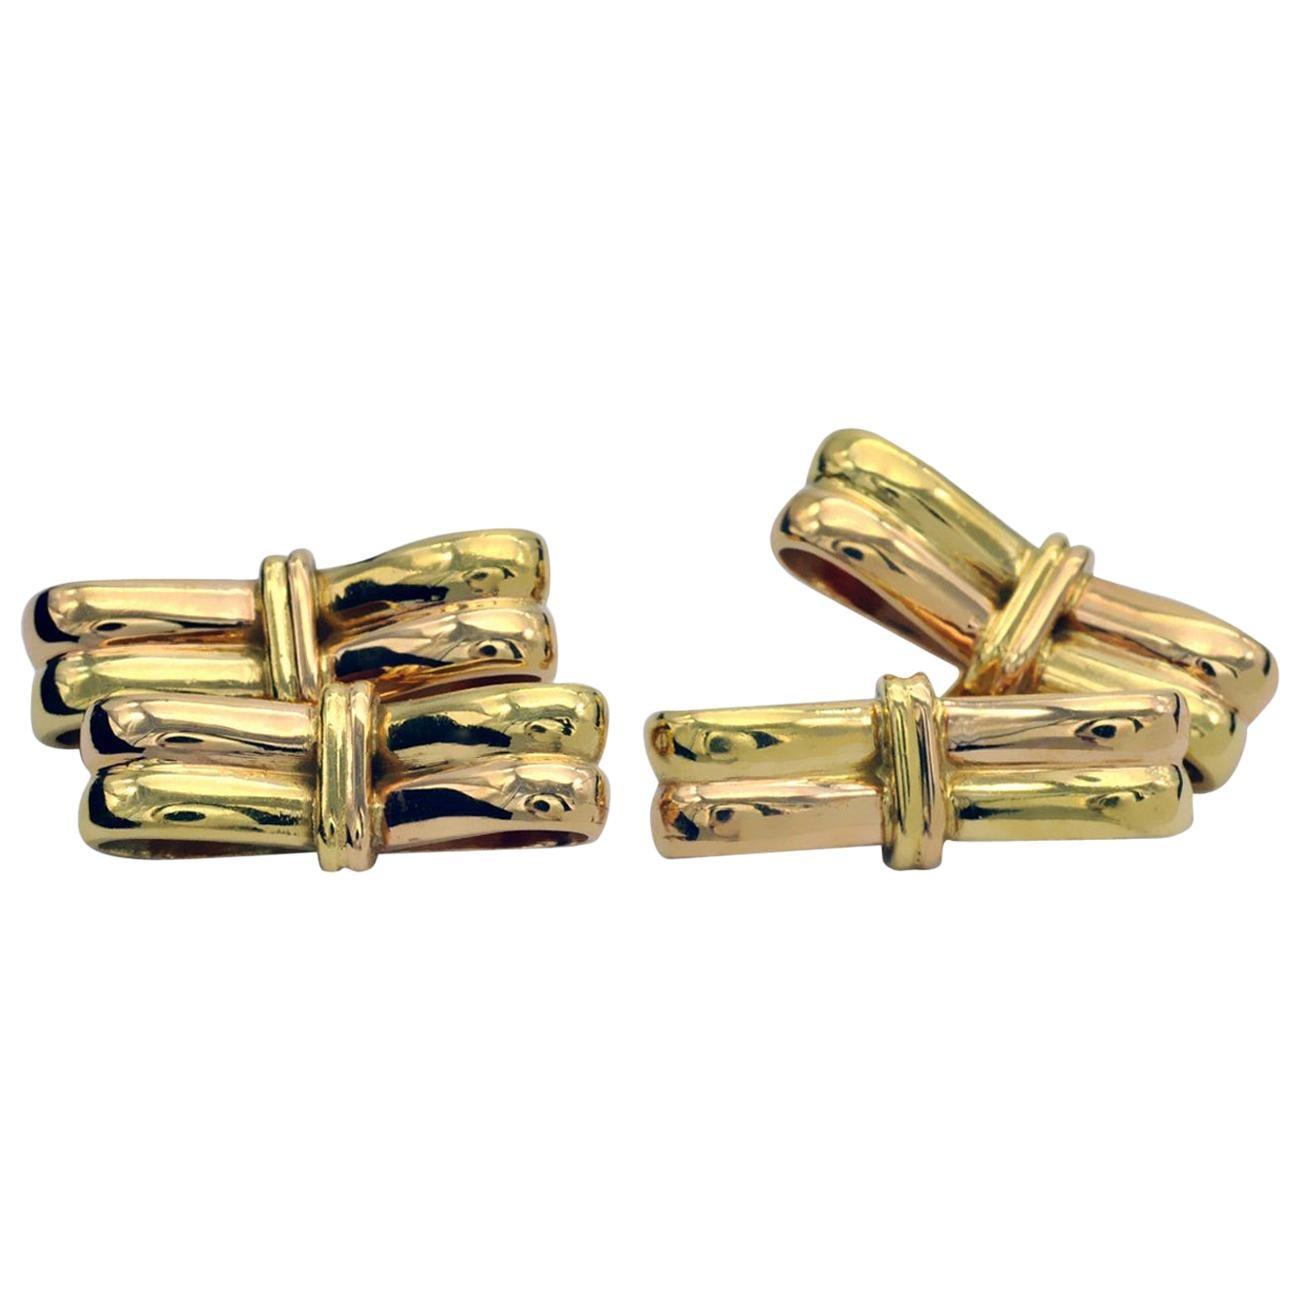 18 Karat Yellow and Rose-Gold Cufflinks